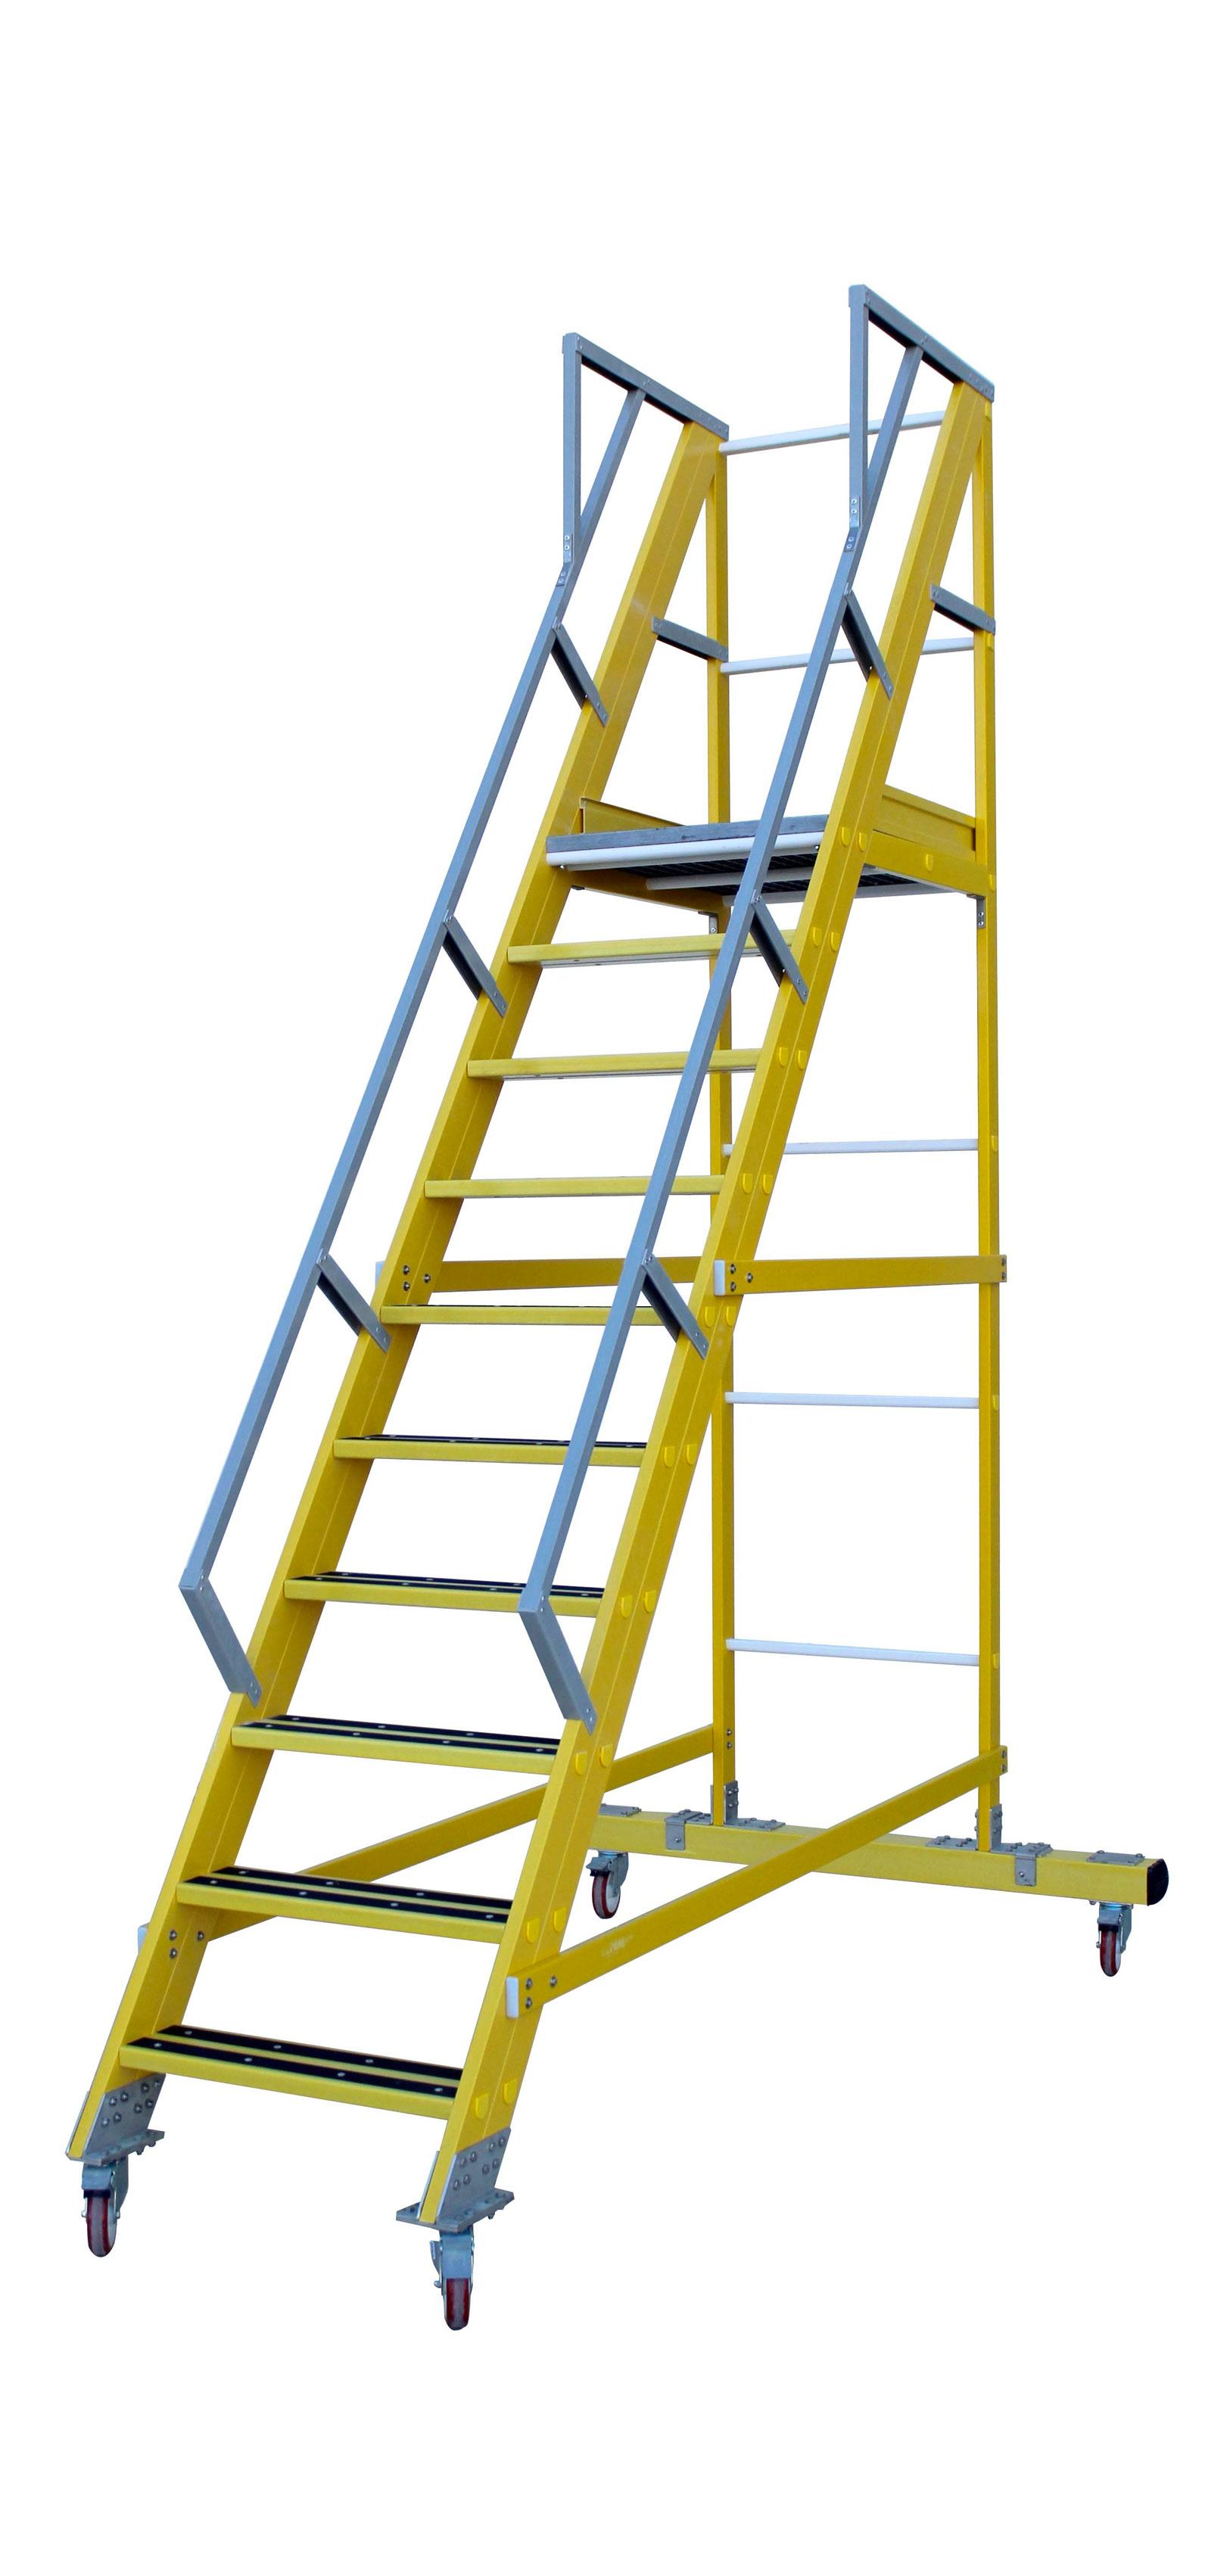 Aluminium folding rolling platform ladder escaleras arizona - Imagenes de escaleras ...